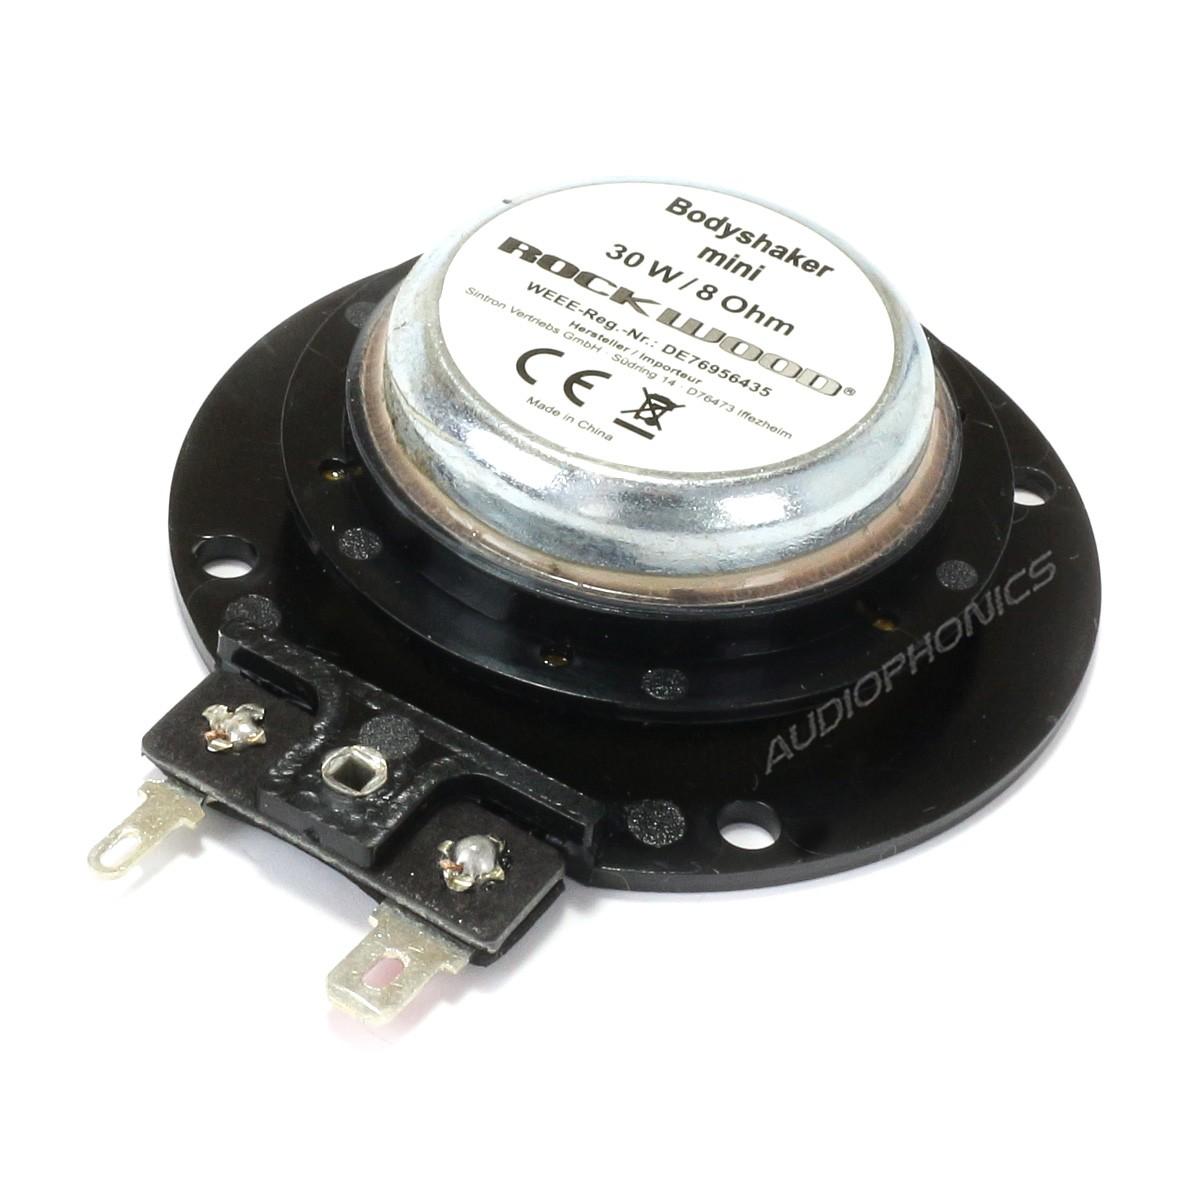 Speaker Driver Exciter Bodyshaker 30W 8 Ohm